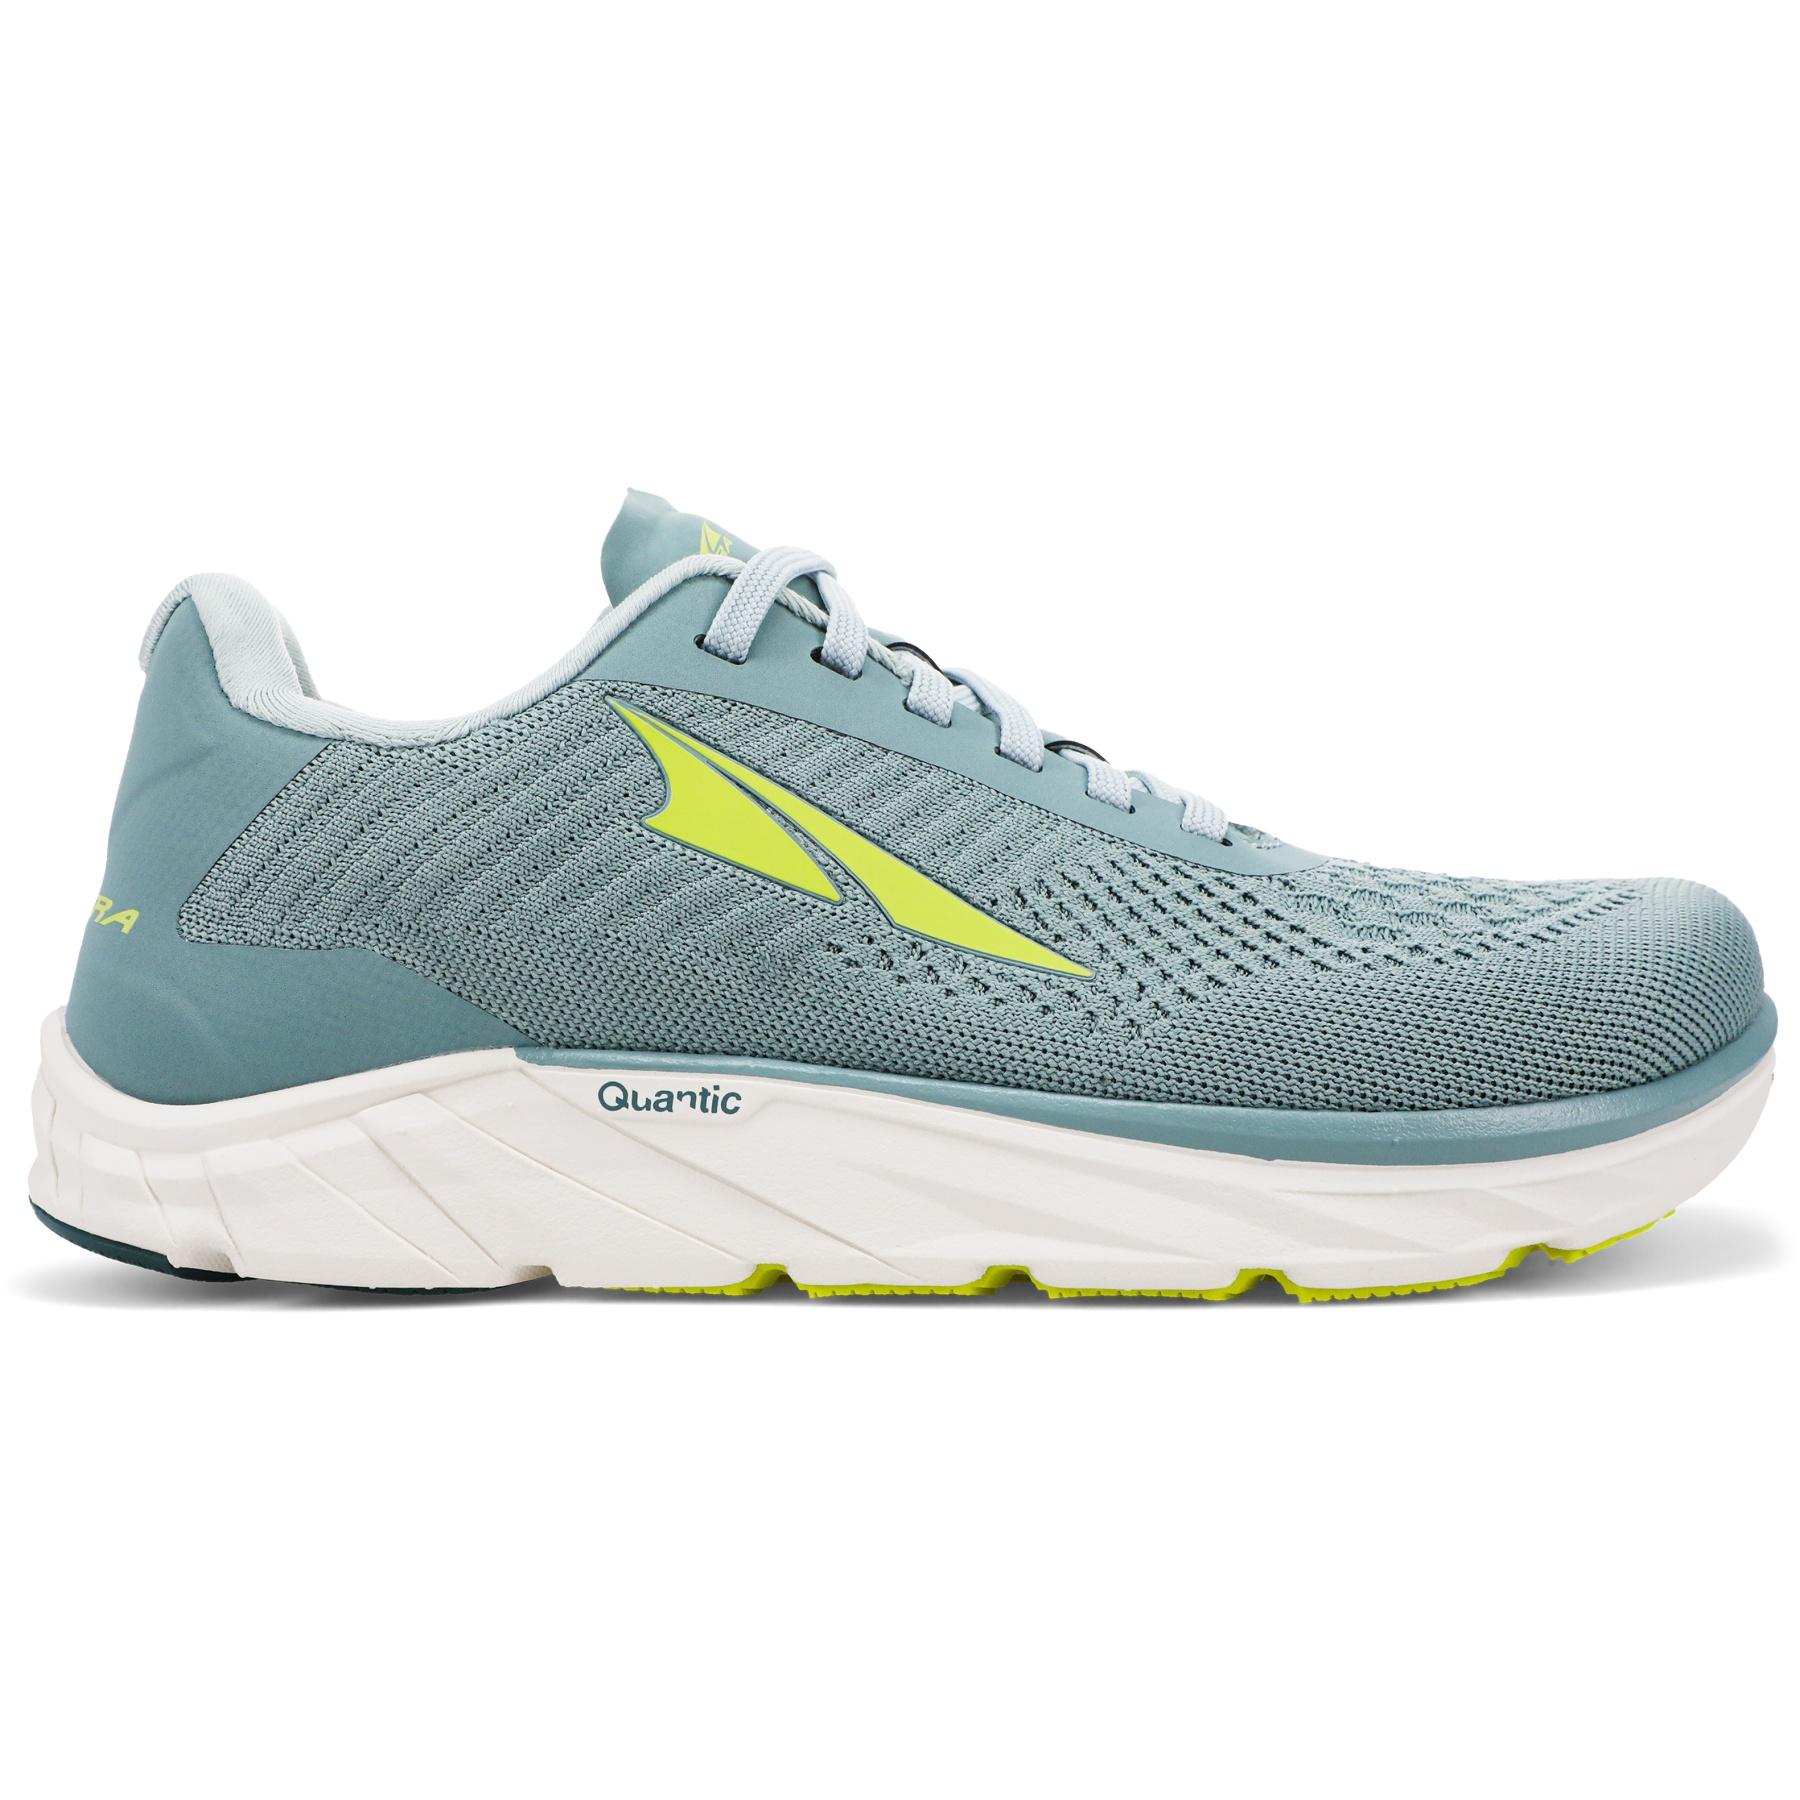 Altra Torin 4.5 Plush Running Shoes Women - Mineral Blue